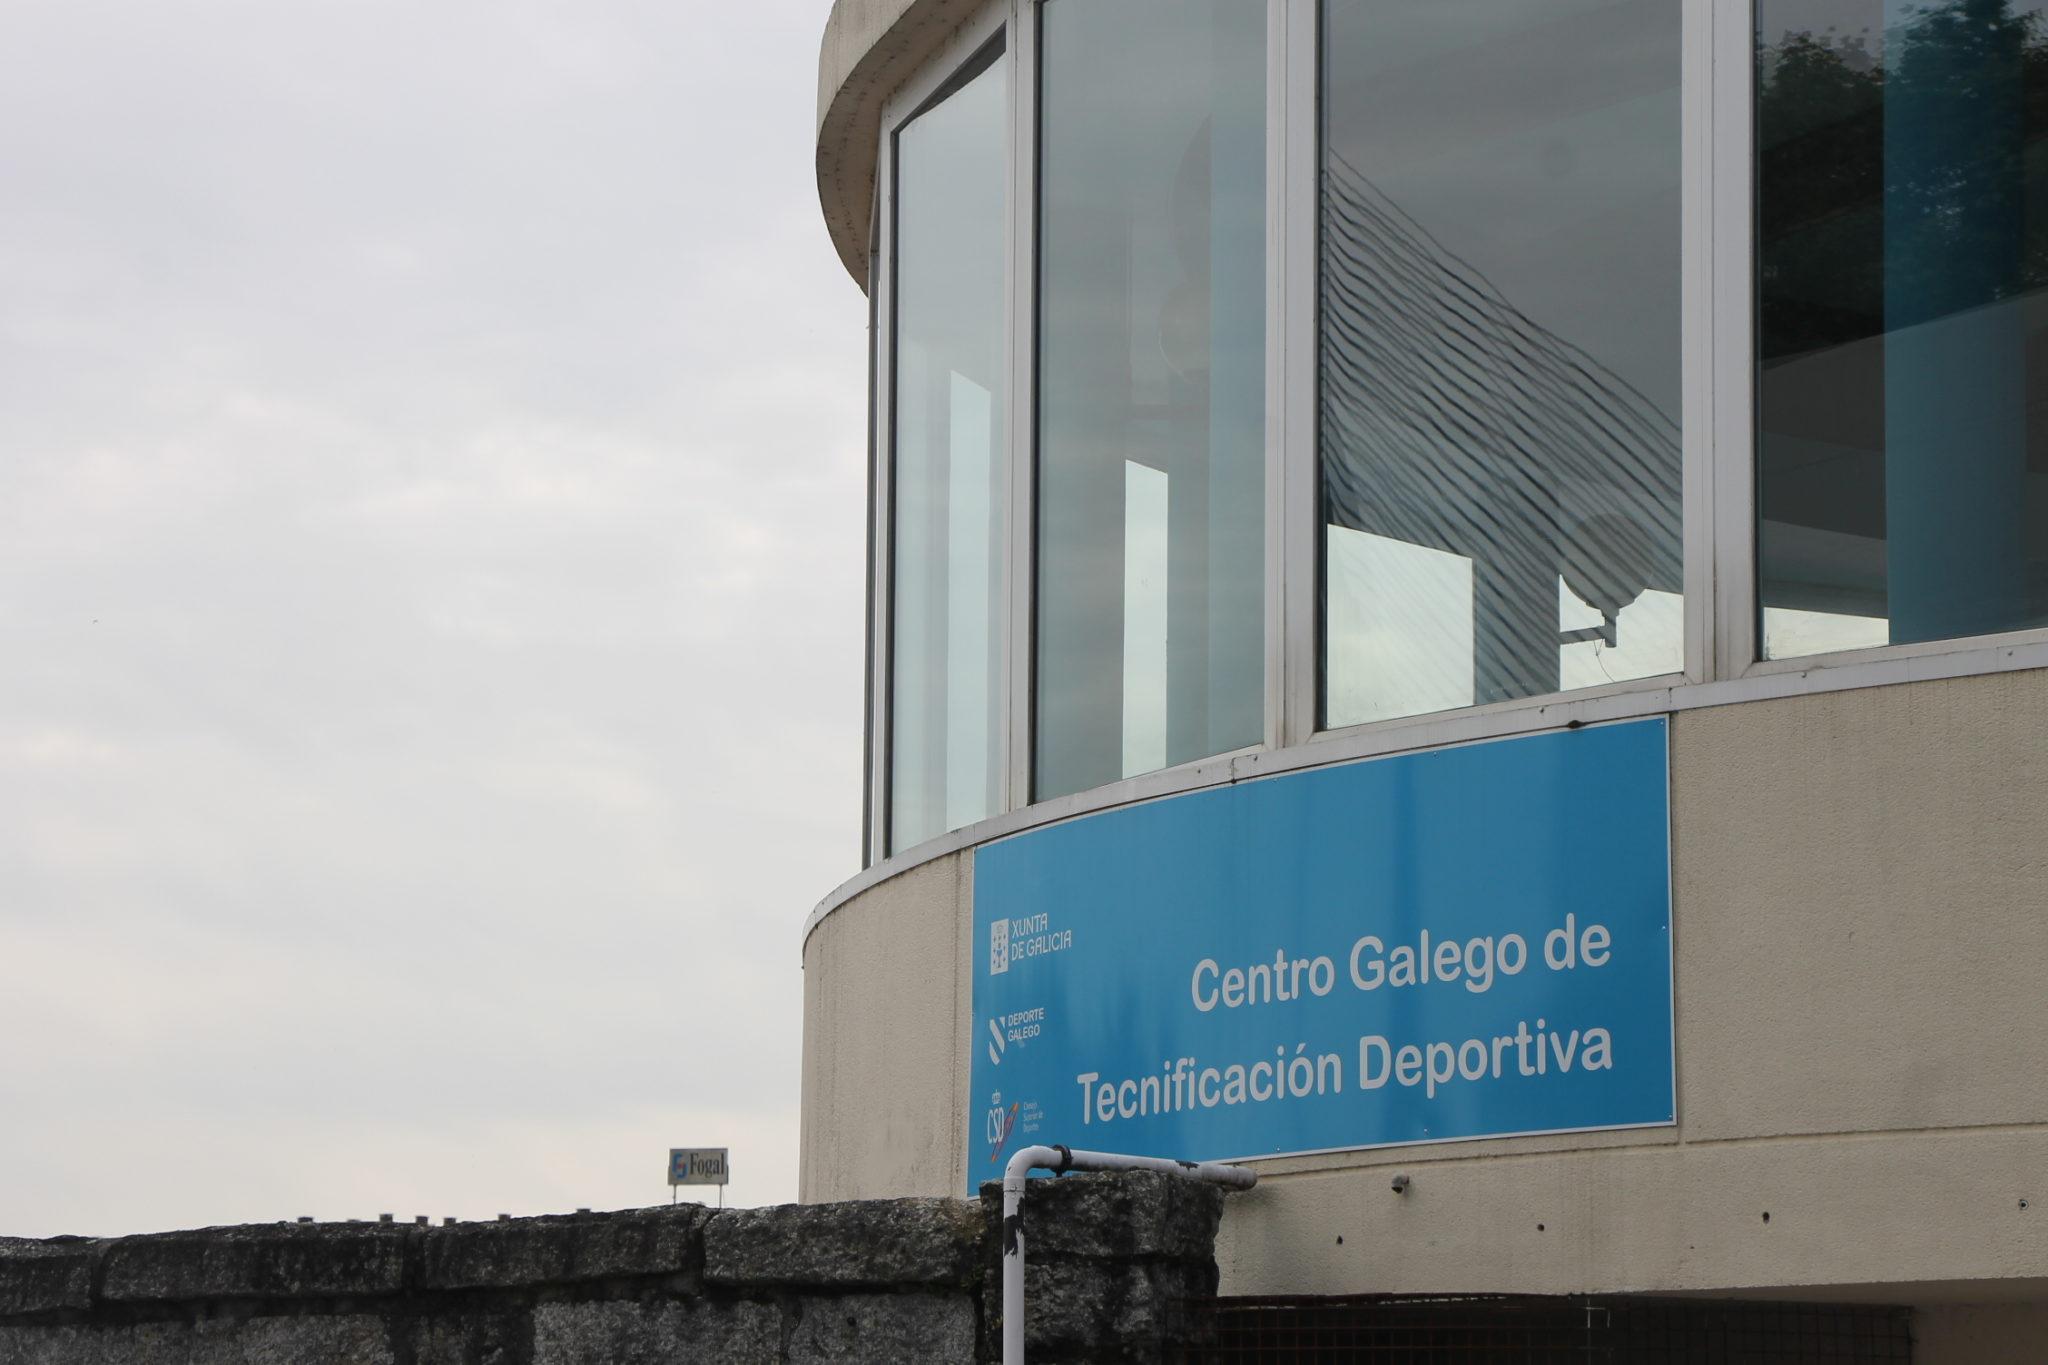 Centro Galego de Tecnificación Deportiva de Pontevedra (CGTD) / SABELA MOSCOSO